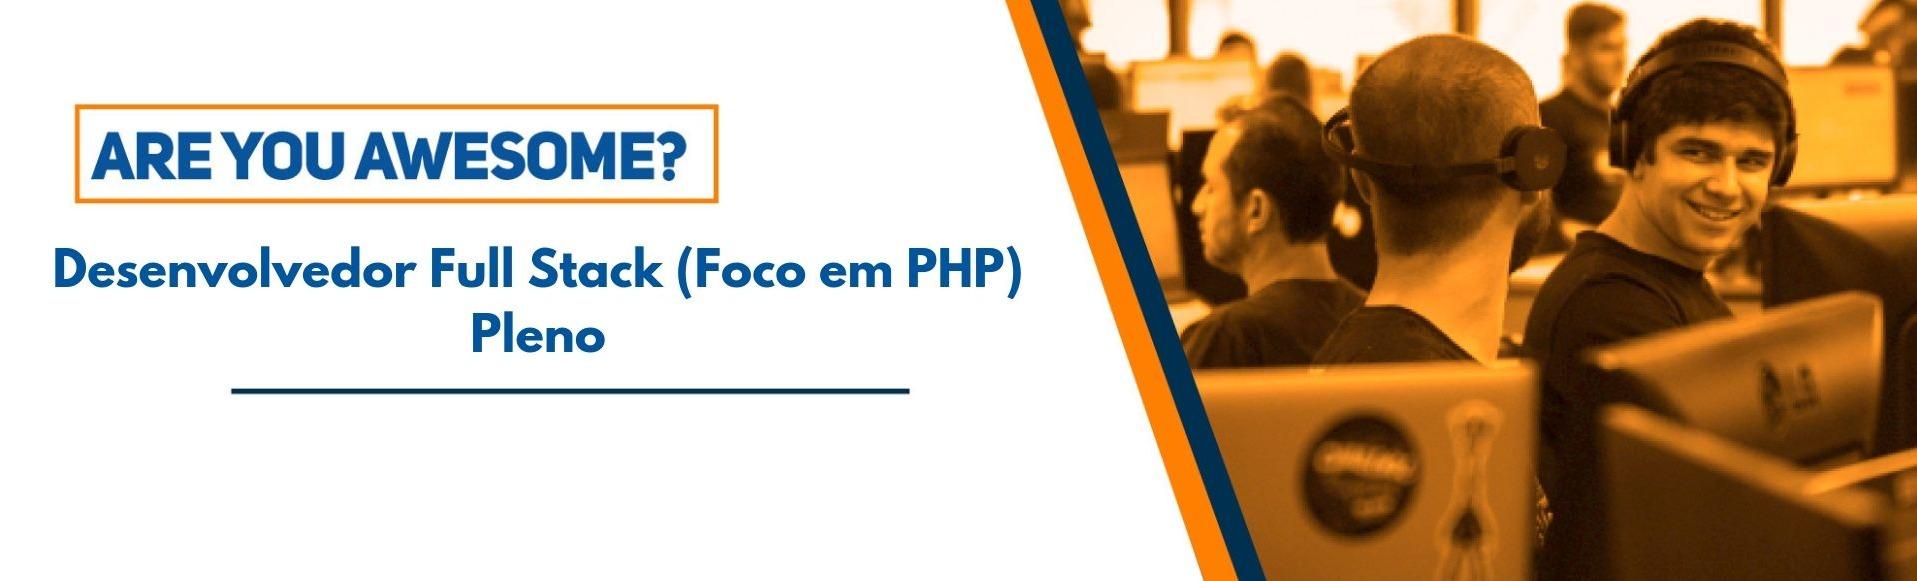 Desenvolvedor Full Stack  (Foco em PHP) Pleno